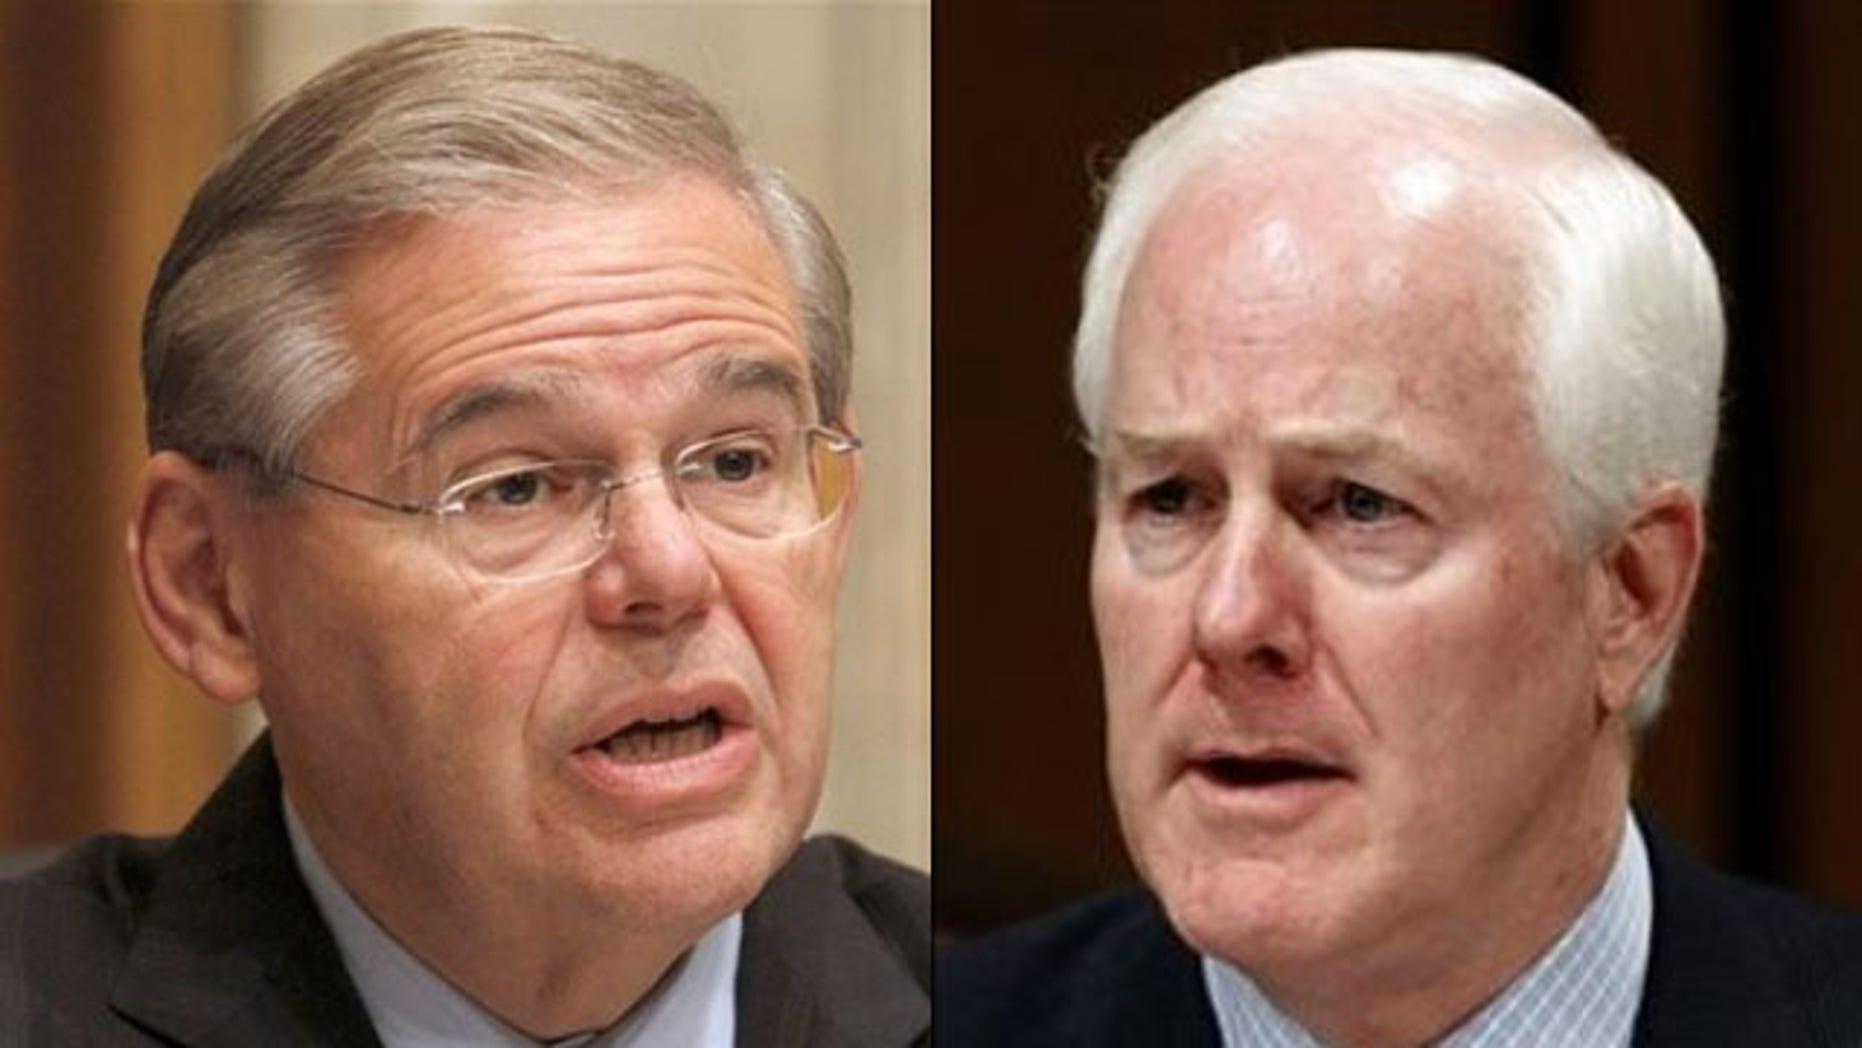 Shown here are Sen. Robert Menendez, left, and Sen. John Cornyn. (AP Photos)